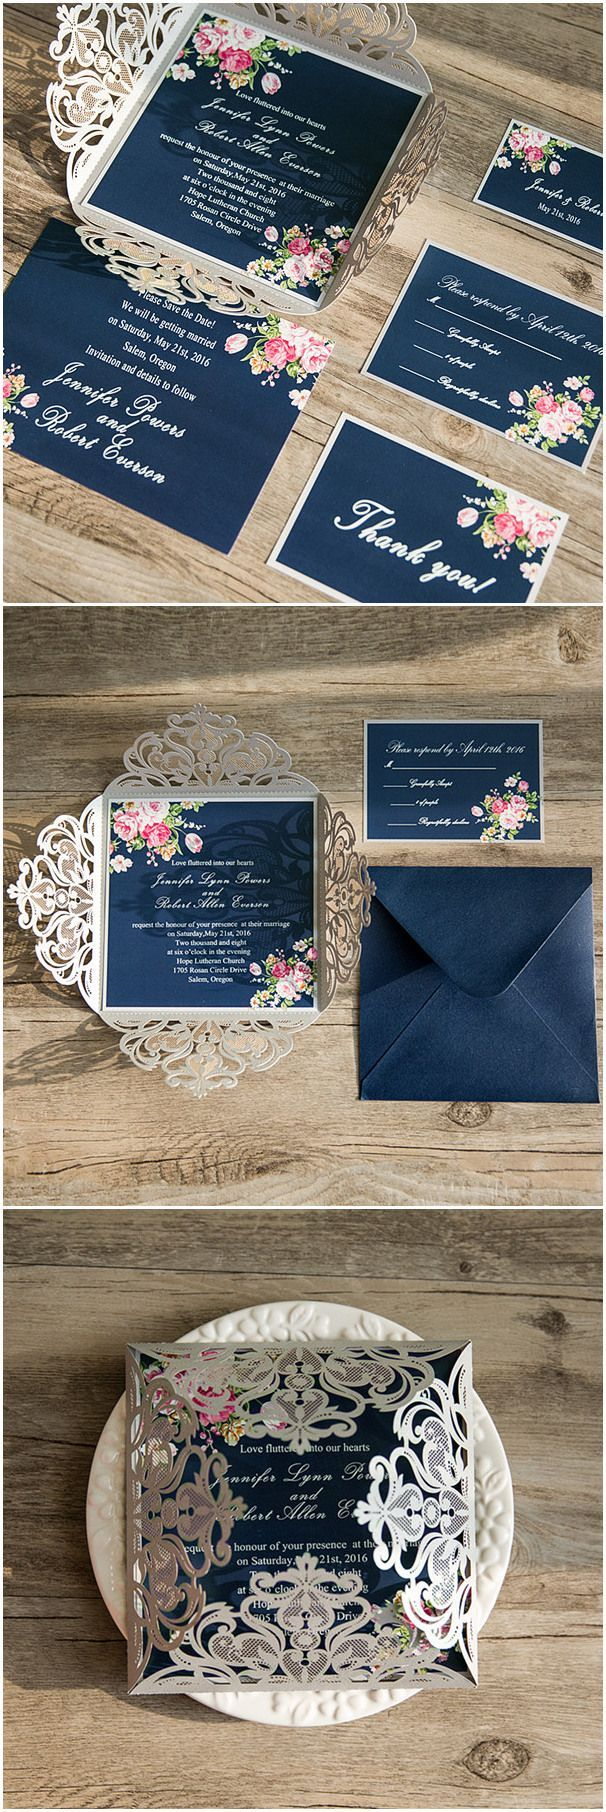 shabby chic navy blue and pink laser cut floral wedding invitations @elegantwinvites